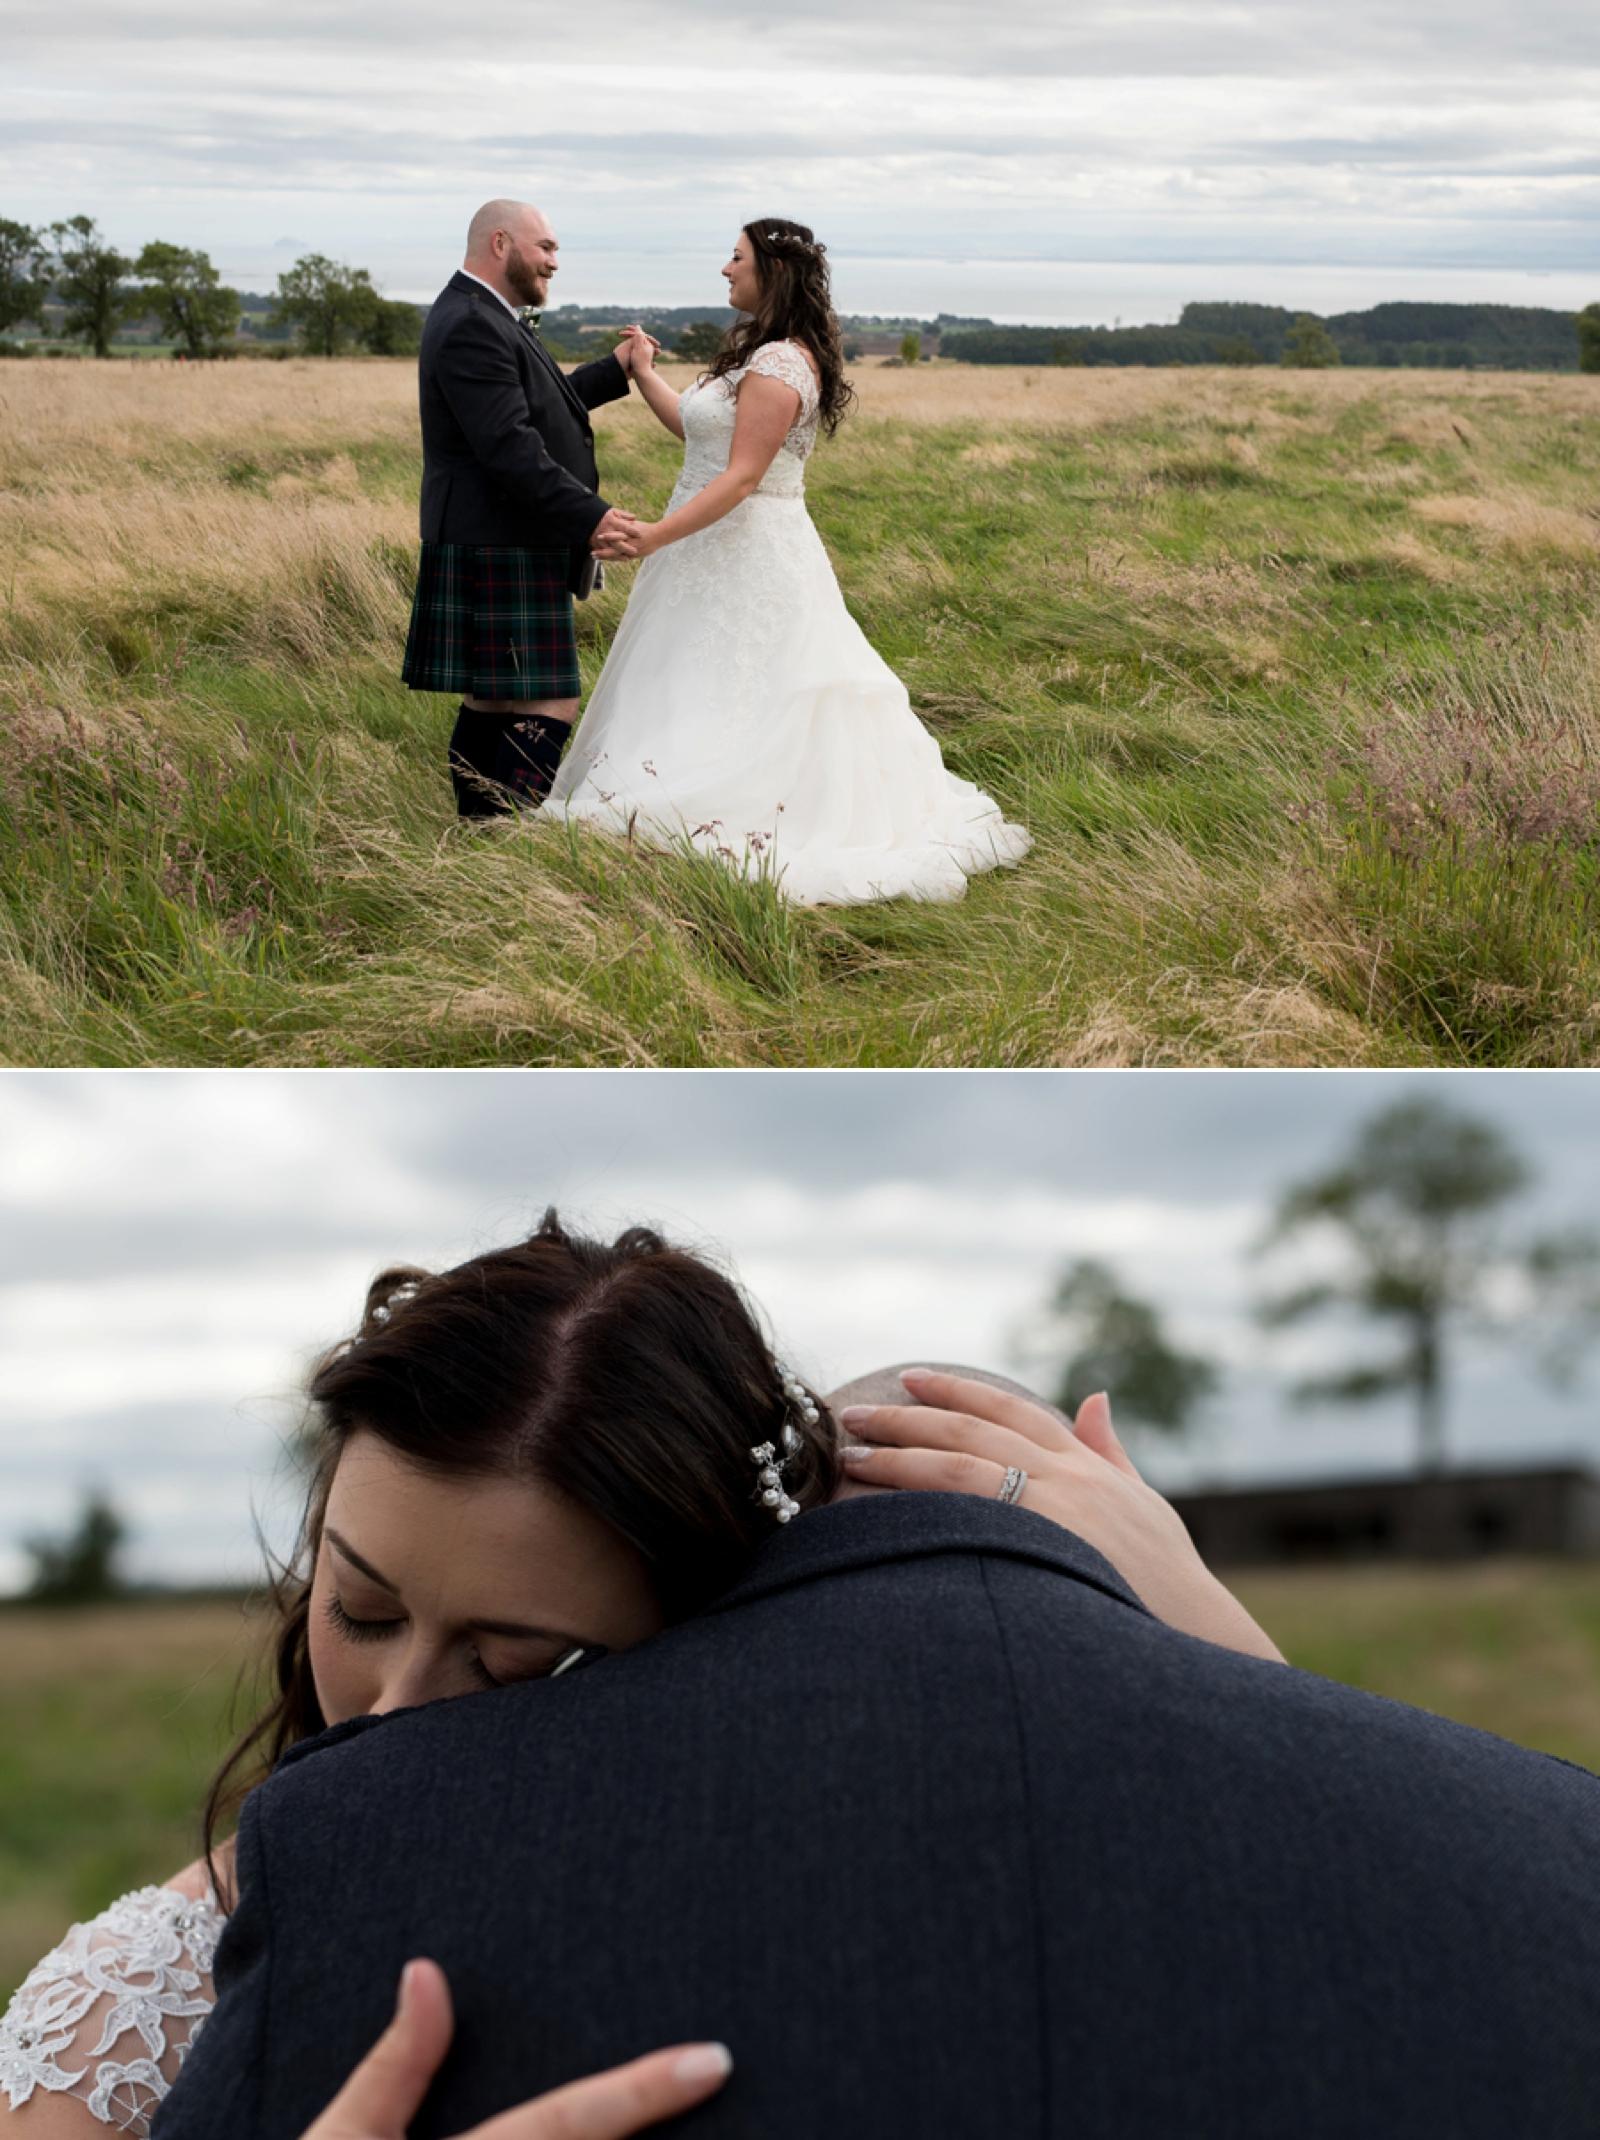 2017-09-23 (Mearns) Pratis Farm Wedding Photography142218.jpg